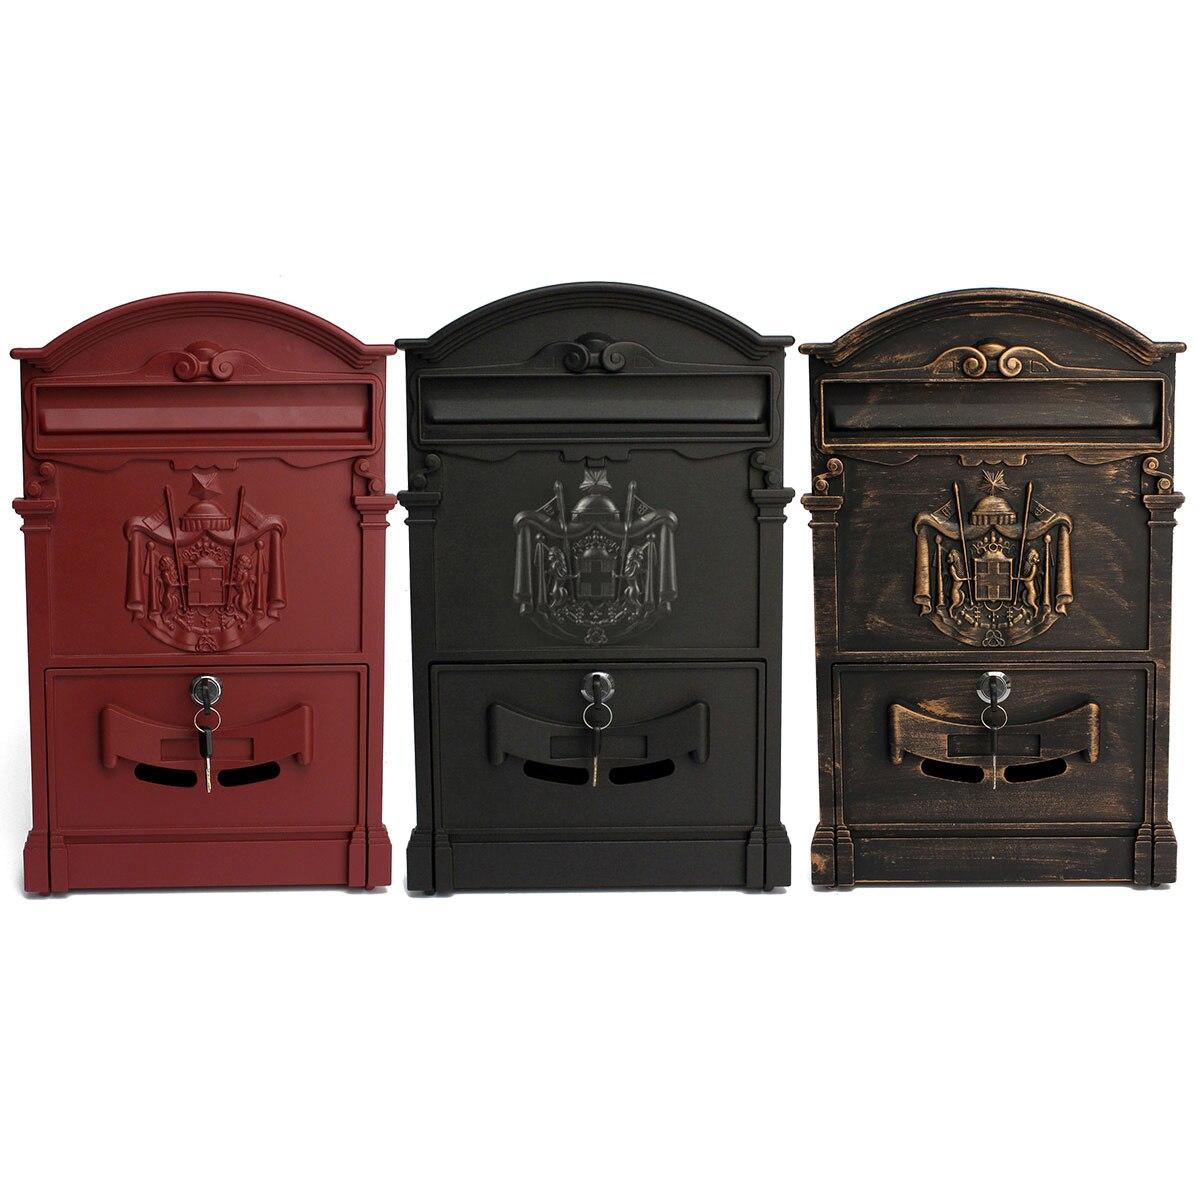 Heavy Duty Aluminium Verrouillable Secure Mail Lettre Boîte aux Lettres Boîte Aux Lettres Boîte Aux Lettres Rétro Vintage Boîte aux Lettres En Métal Ornement De Jardin